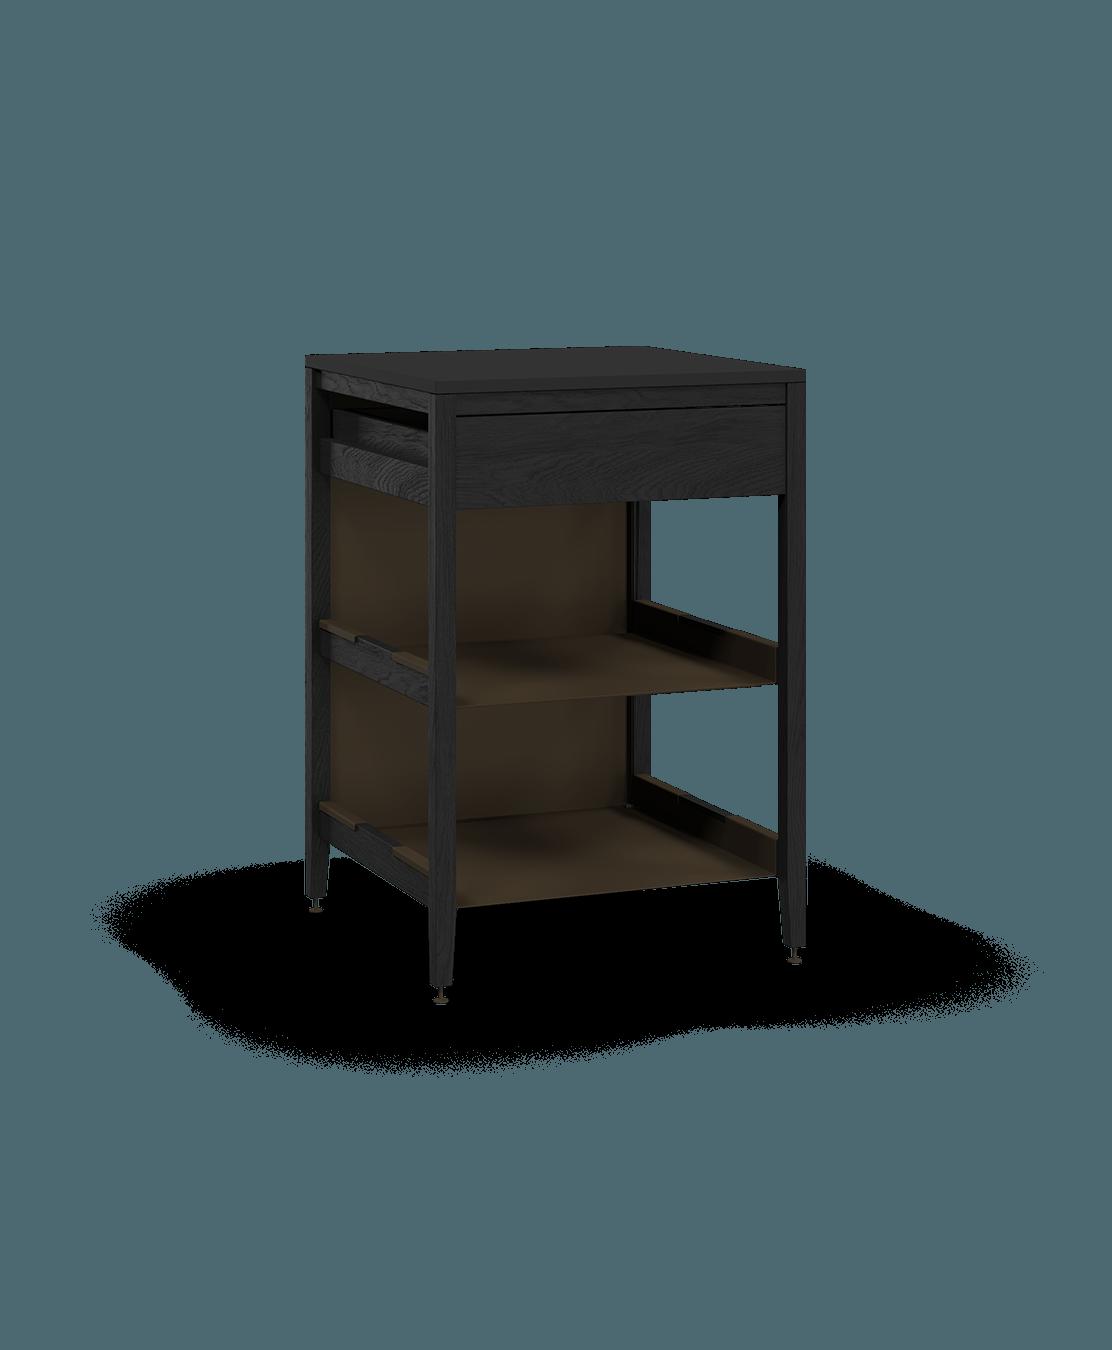 coquo radix midnight black stained oak solid wood modular 2 shelves 1 drawer base kitchen cabinet 27 inch C1-C-27TB-1021-BK